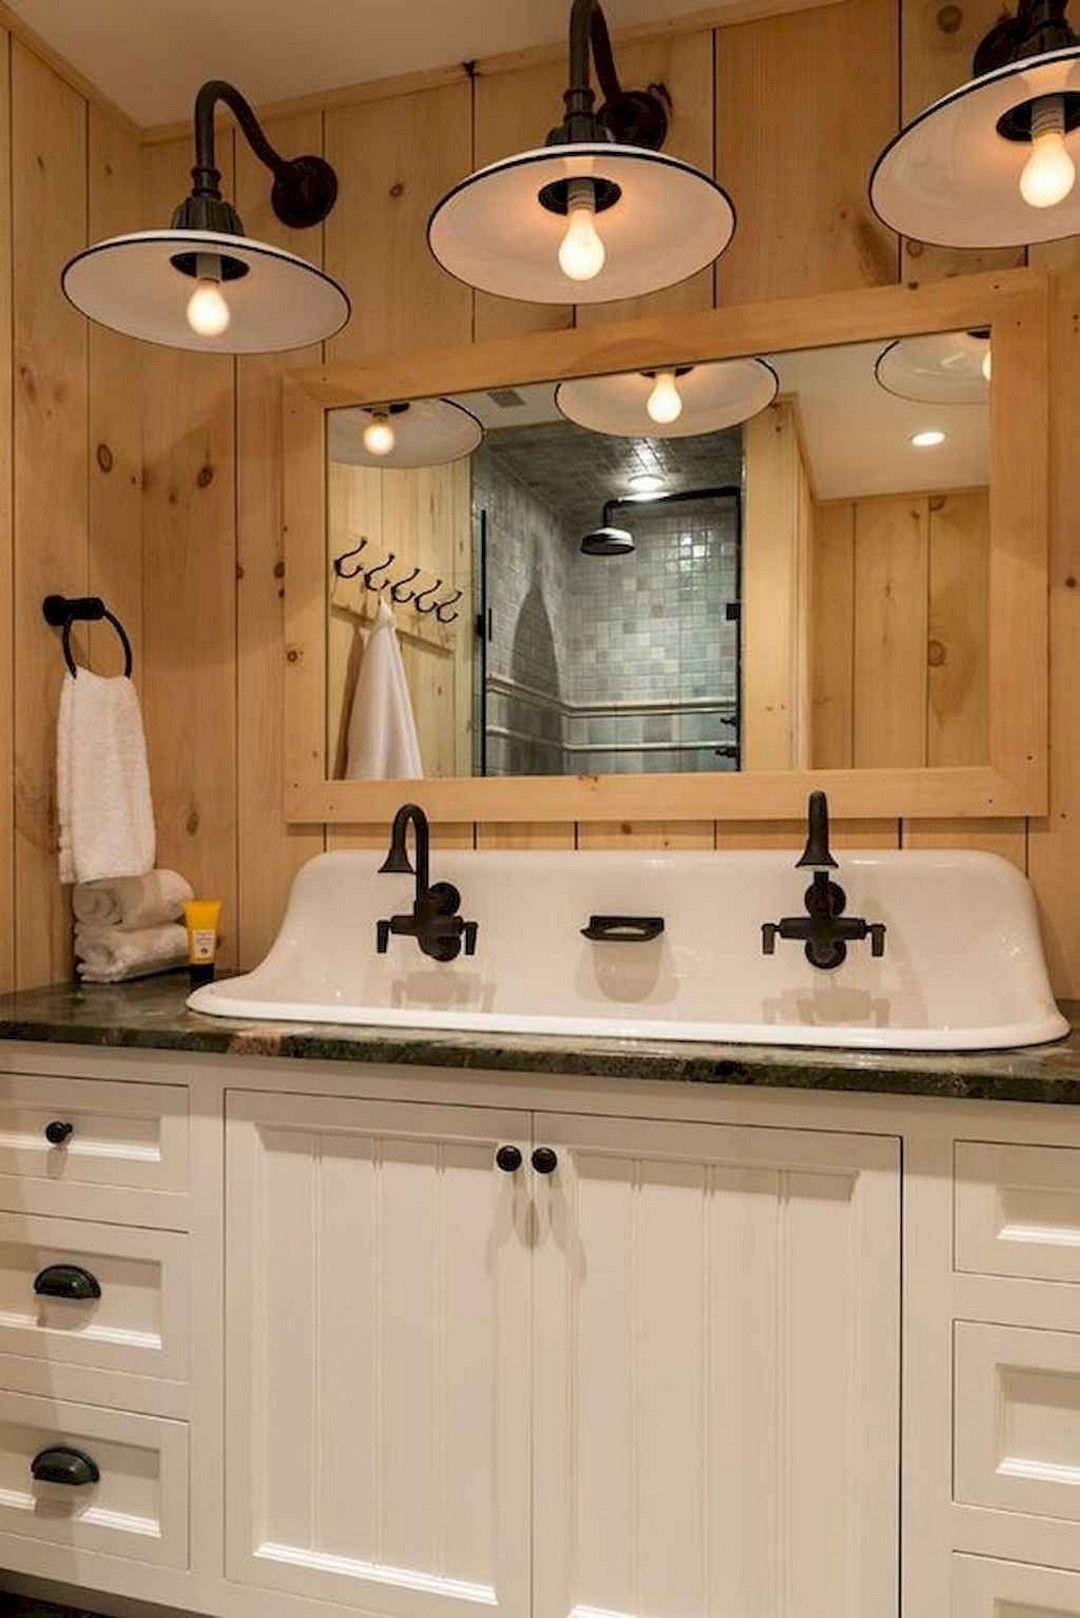 25 Cozy Rustic Bathroom Decor To Guide Your Renovation - W14